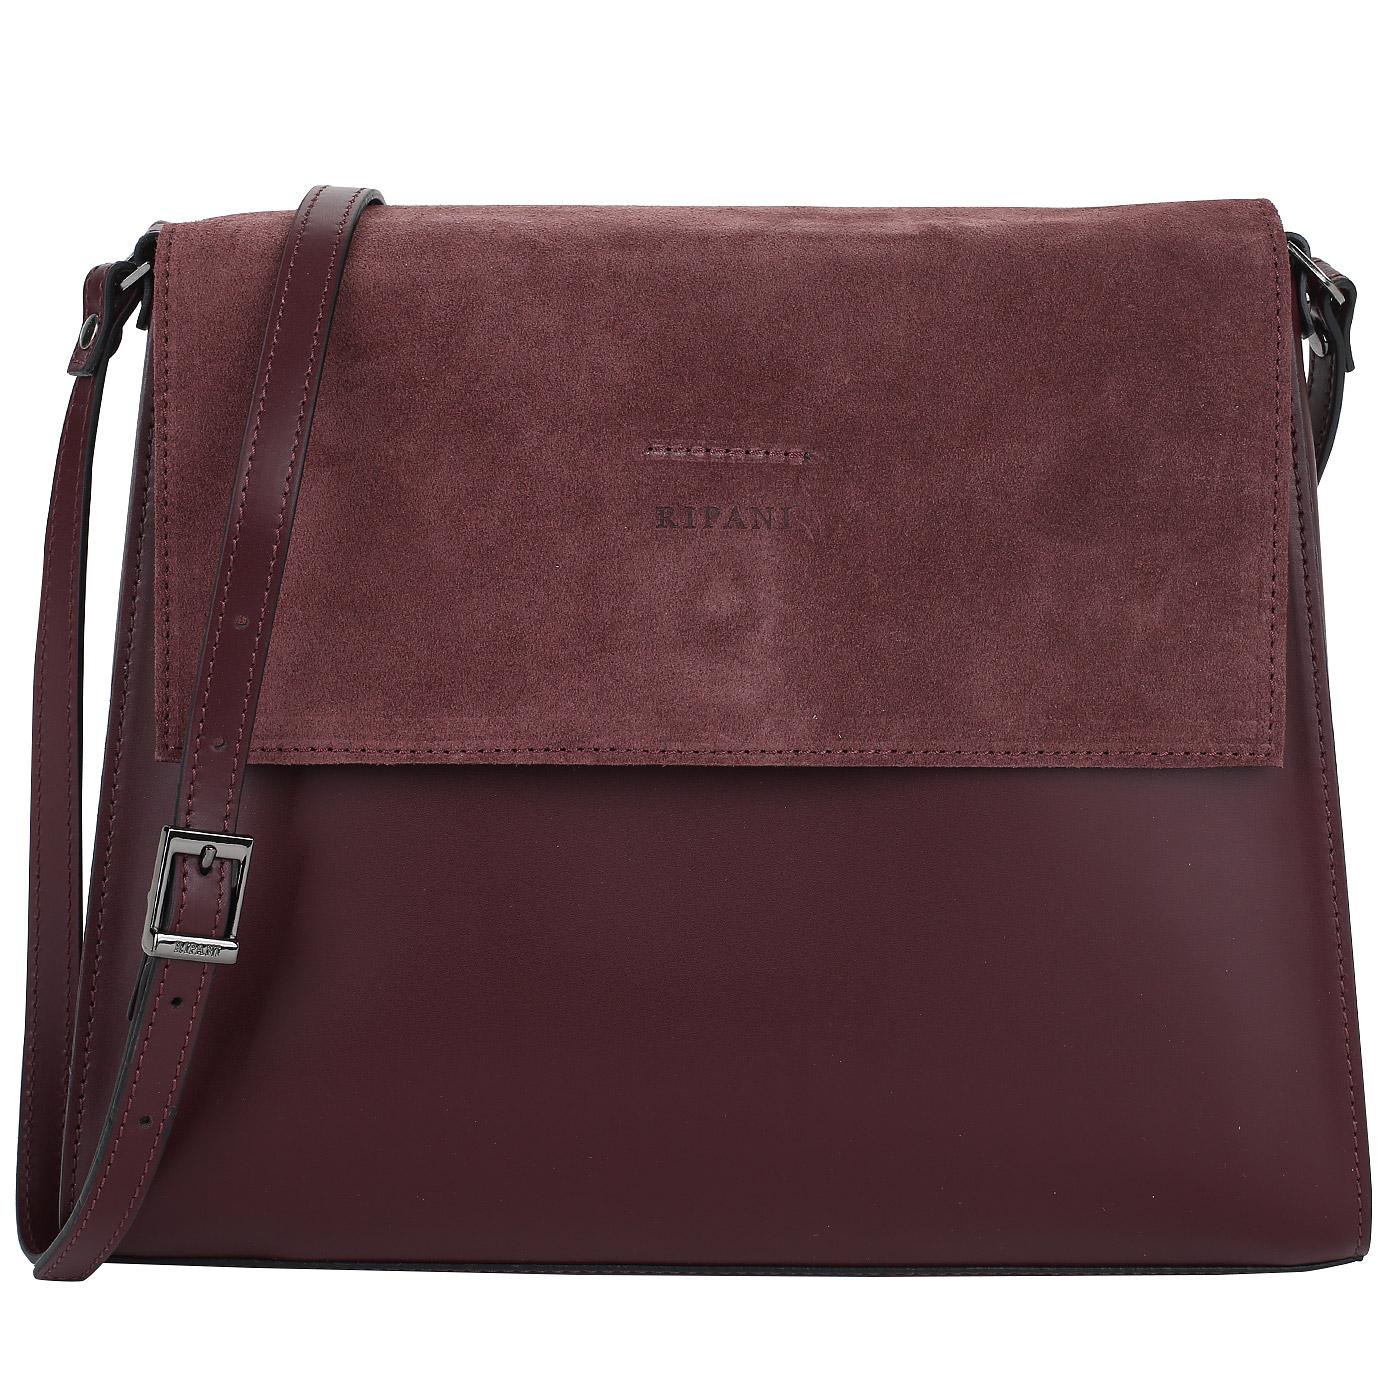 8dd95a27a85a Бордовая сумка через плечо Ripani Pachira Бордовая сумка через плечо Ripani  Pachira ...